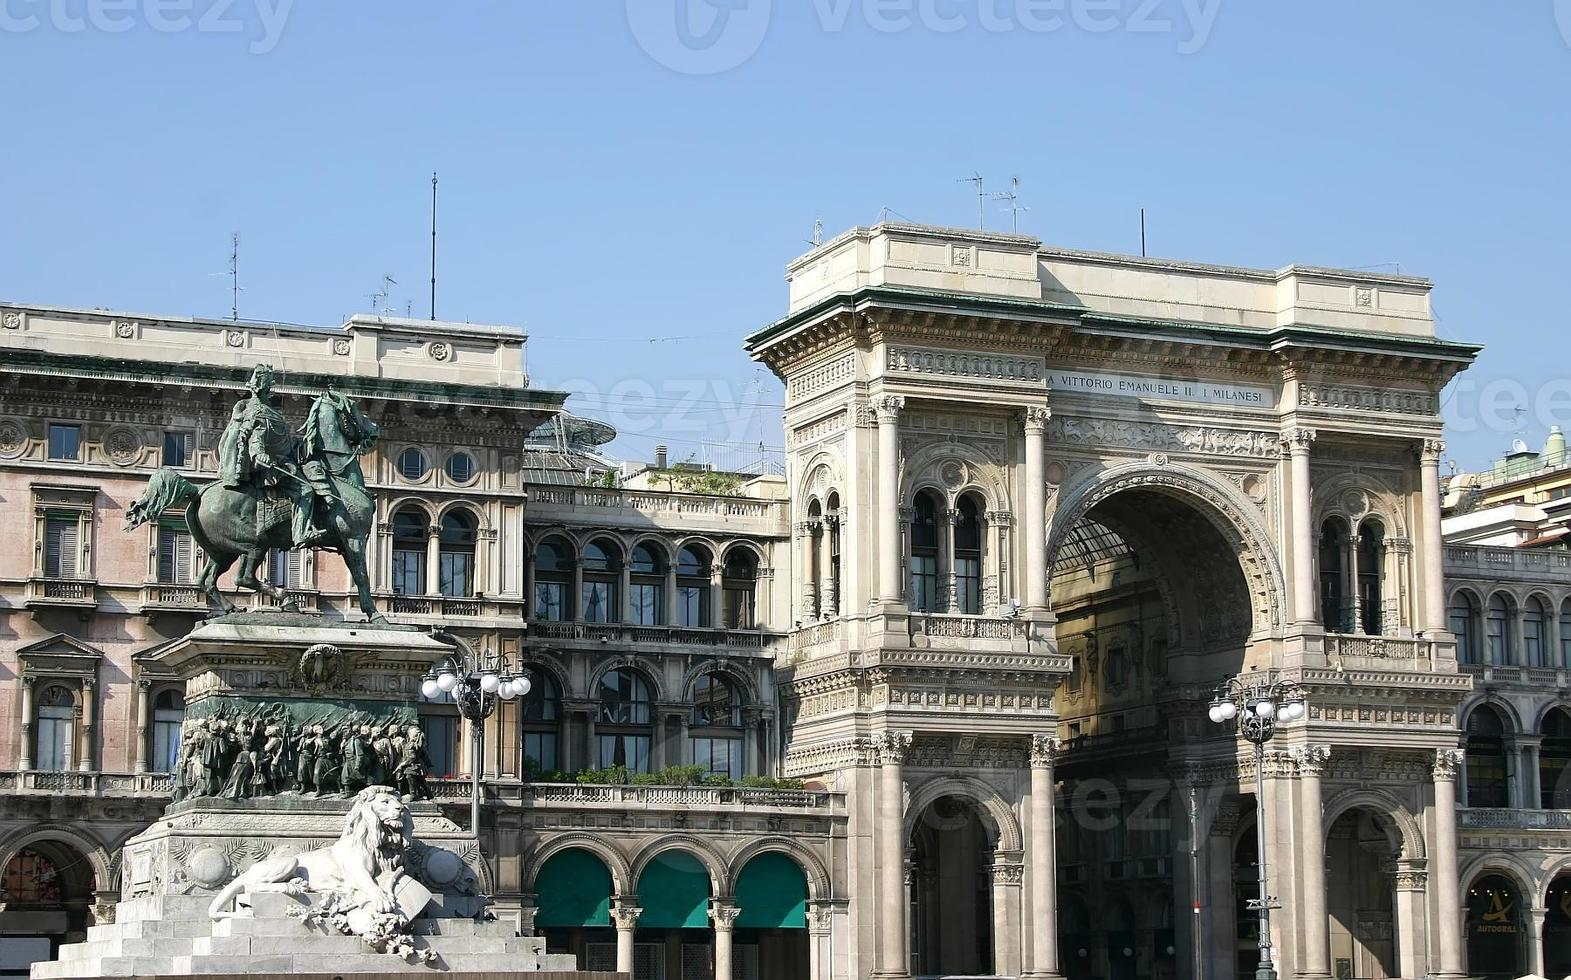 vittorio emanuele ii gallery, milan, italy foto